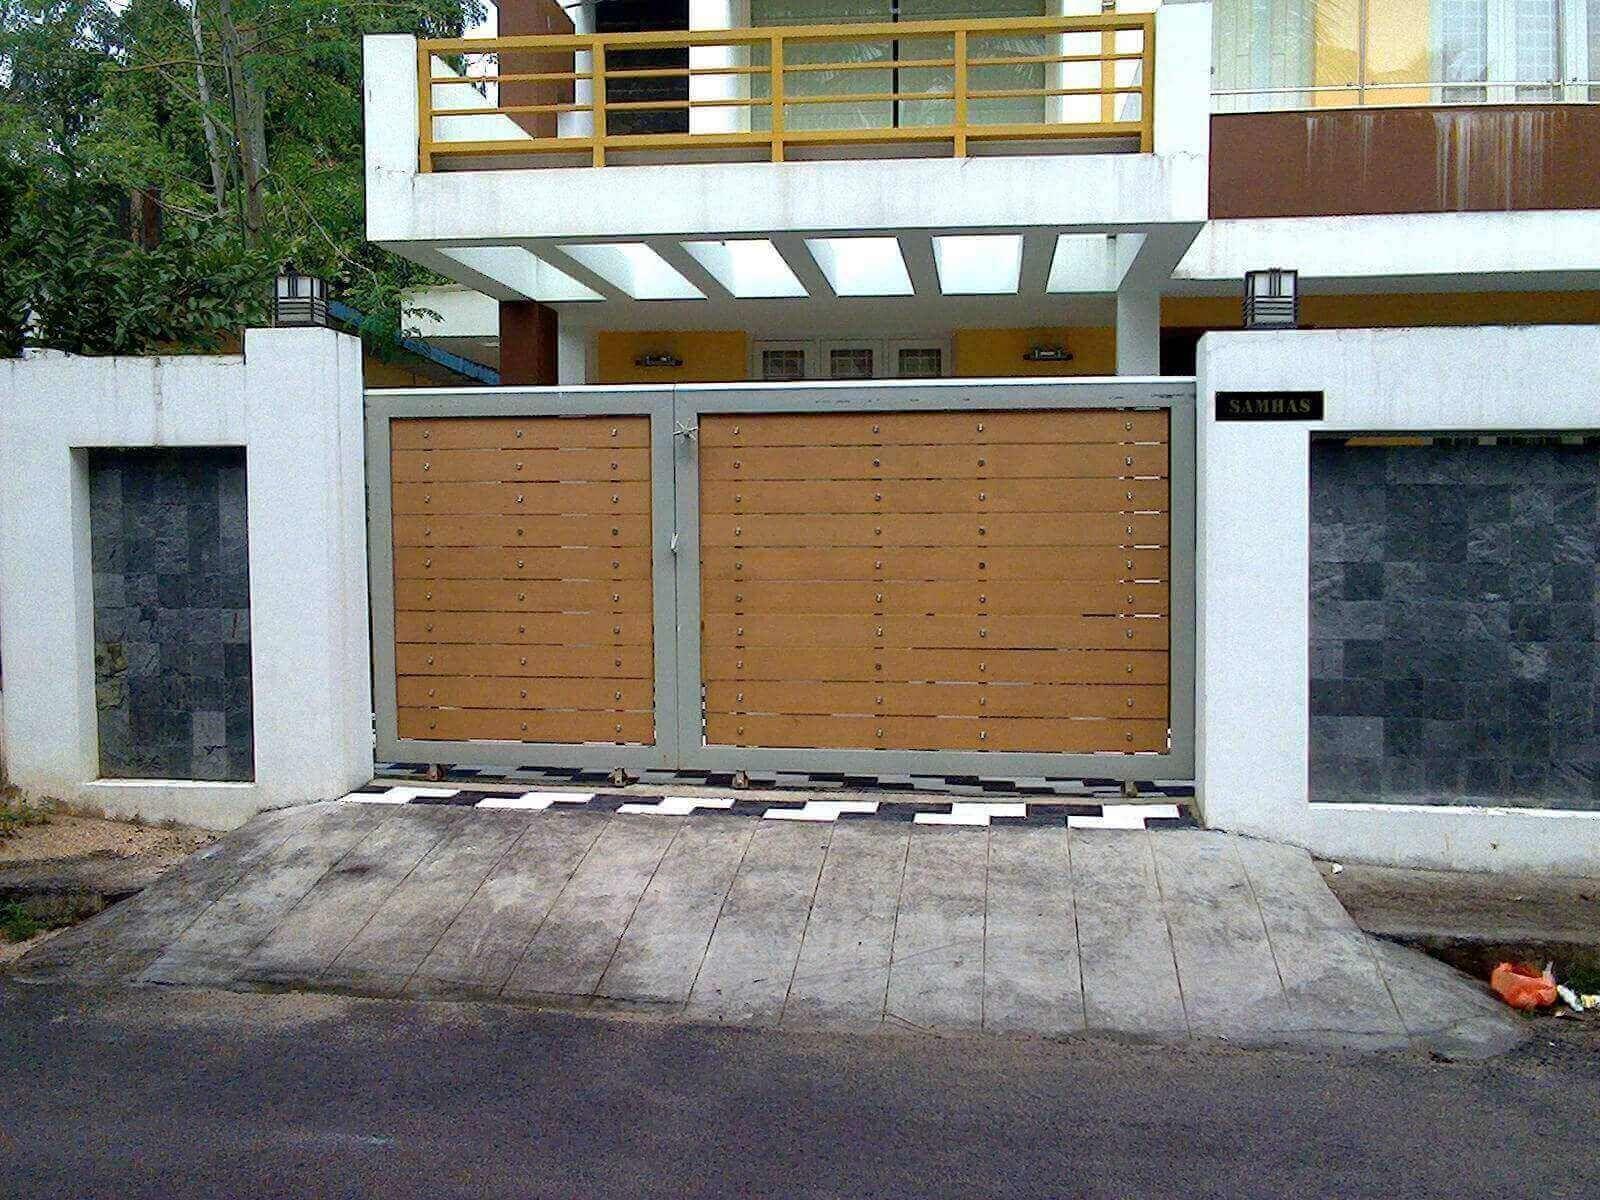 Gates   Kerala Gates   MS Gates   Steel Gates   Kochi   Kerala. Gates   Kerala Gates   MS Gates   Steel Gates   Kochi   Kerala